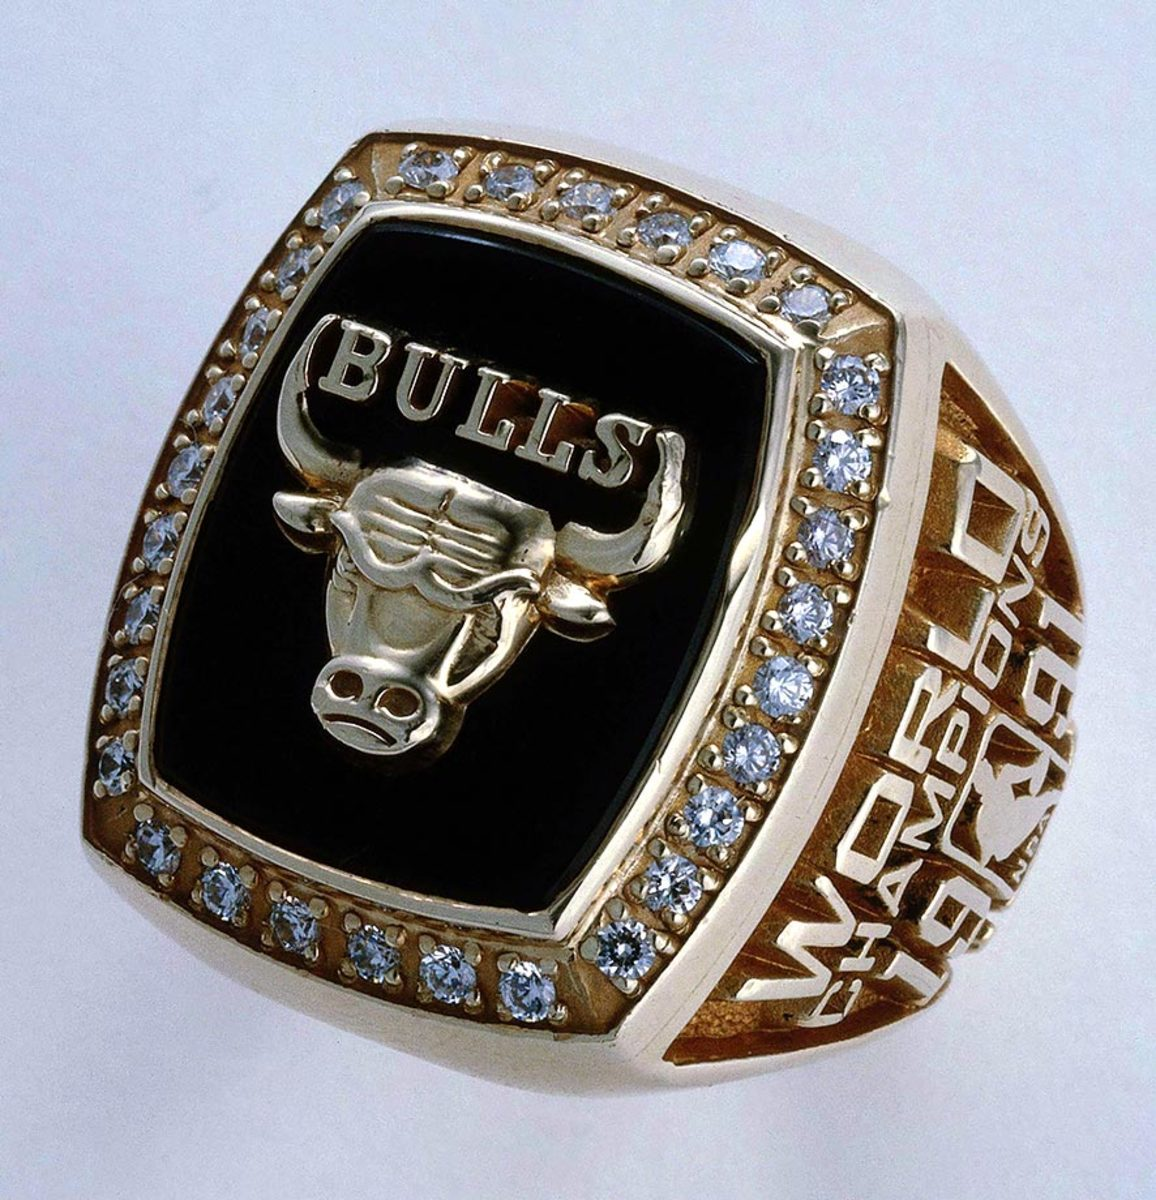 1991-Chicago-Bulls-NBA-Championship-ring.jpg